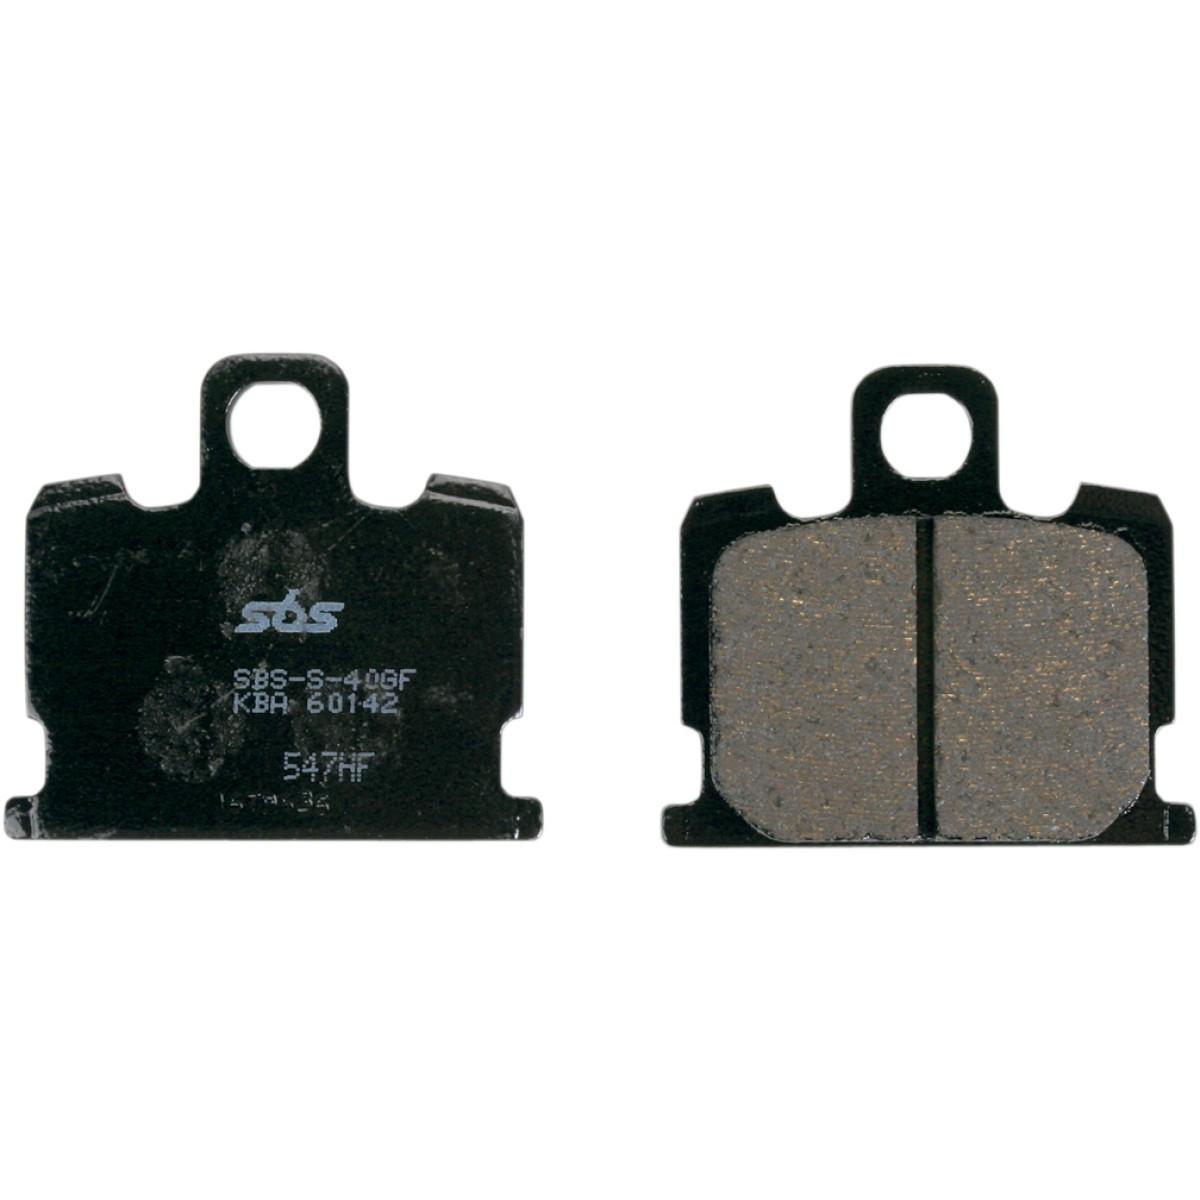 SBS HF Ceramic Brake Pads - 547HF